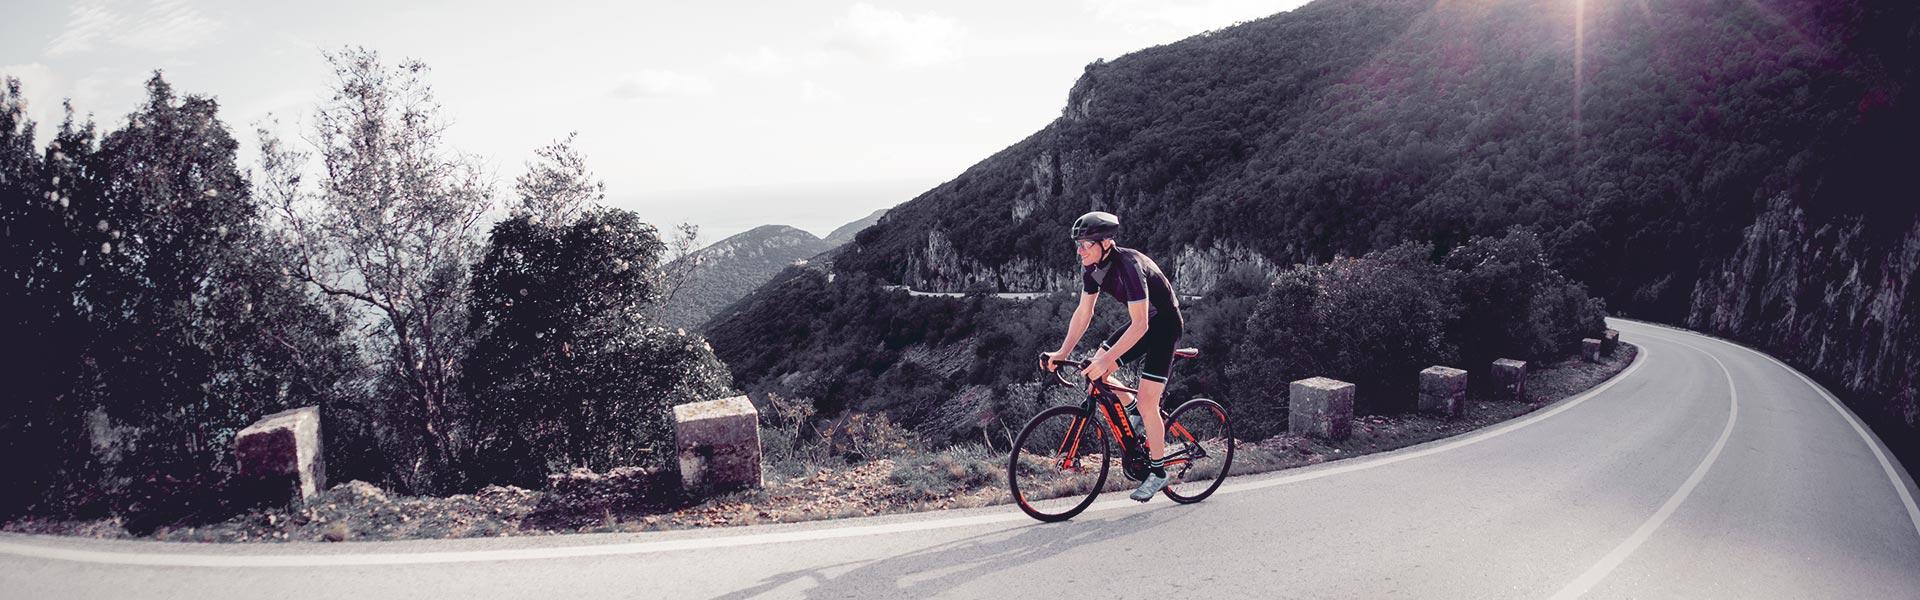 On-Road E-bikes